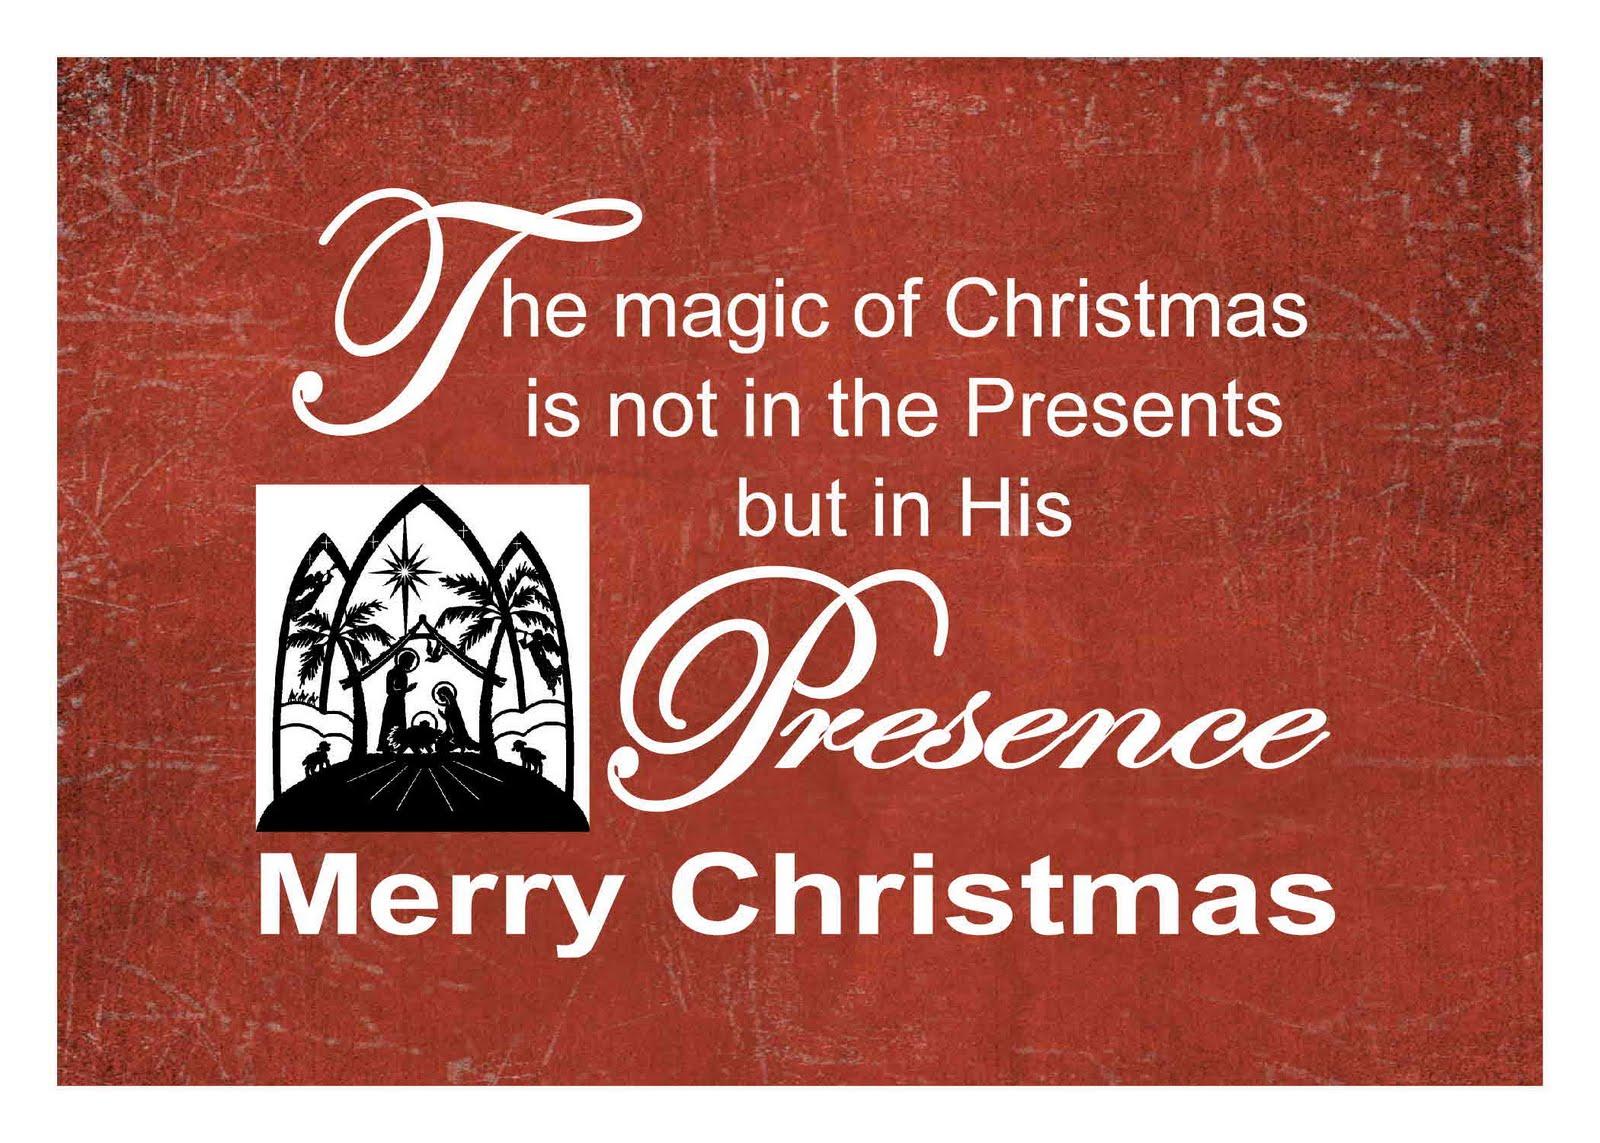 MERRY CHRISTMAS MY FRIEND